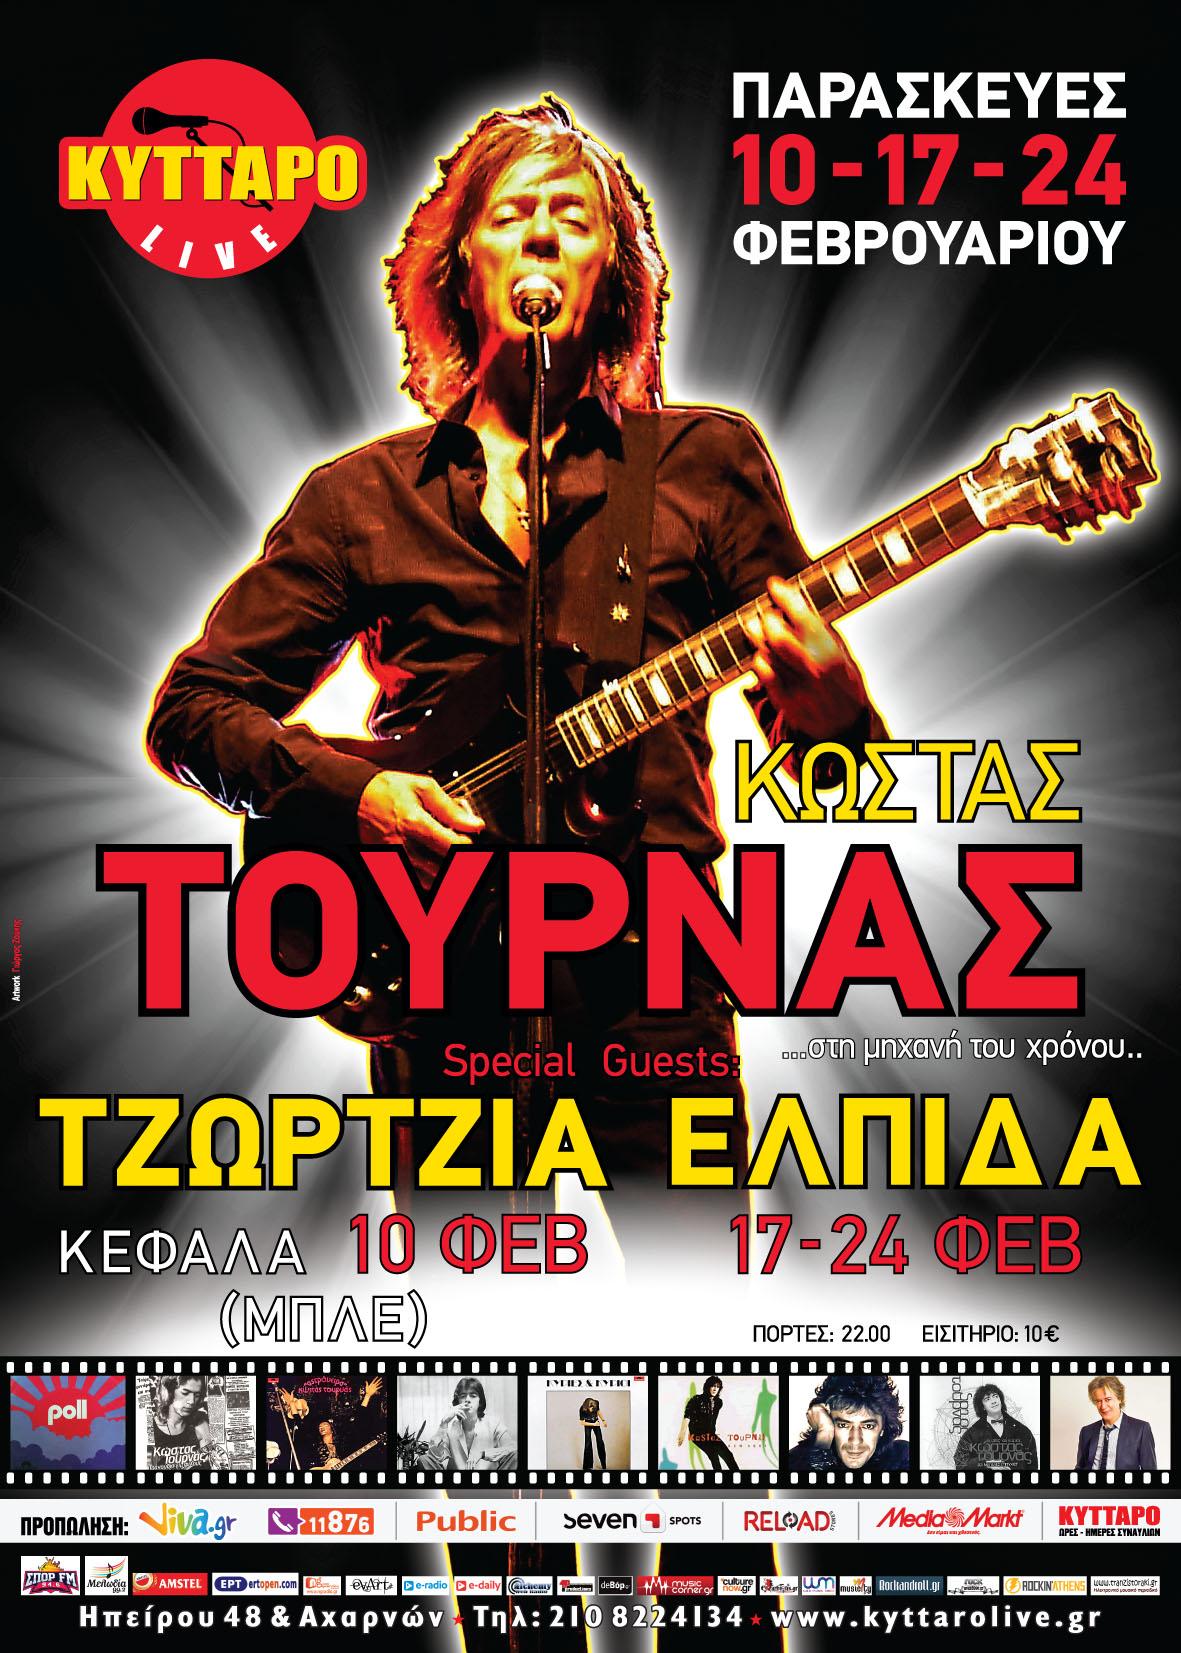 Kyttaro Tournas Feb_F.cdr